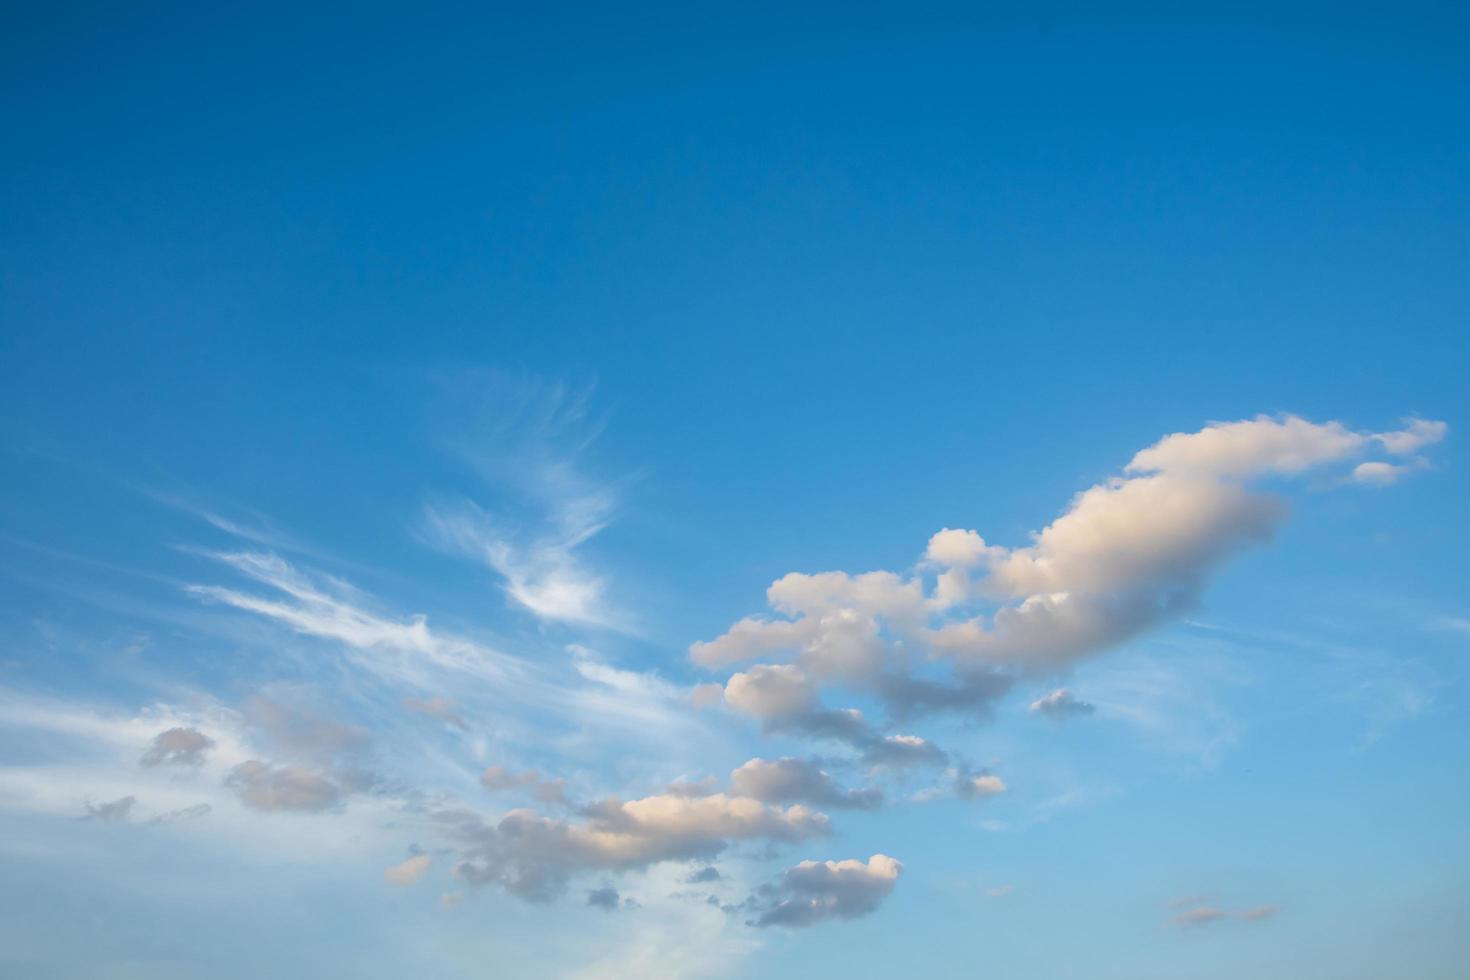 wolken in een blauwe hemel foto